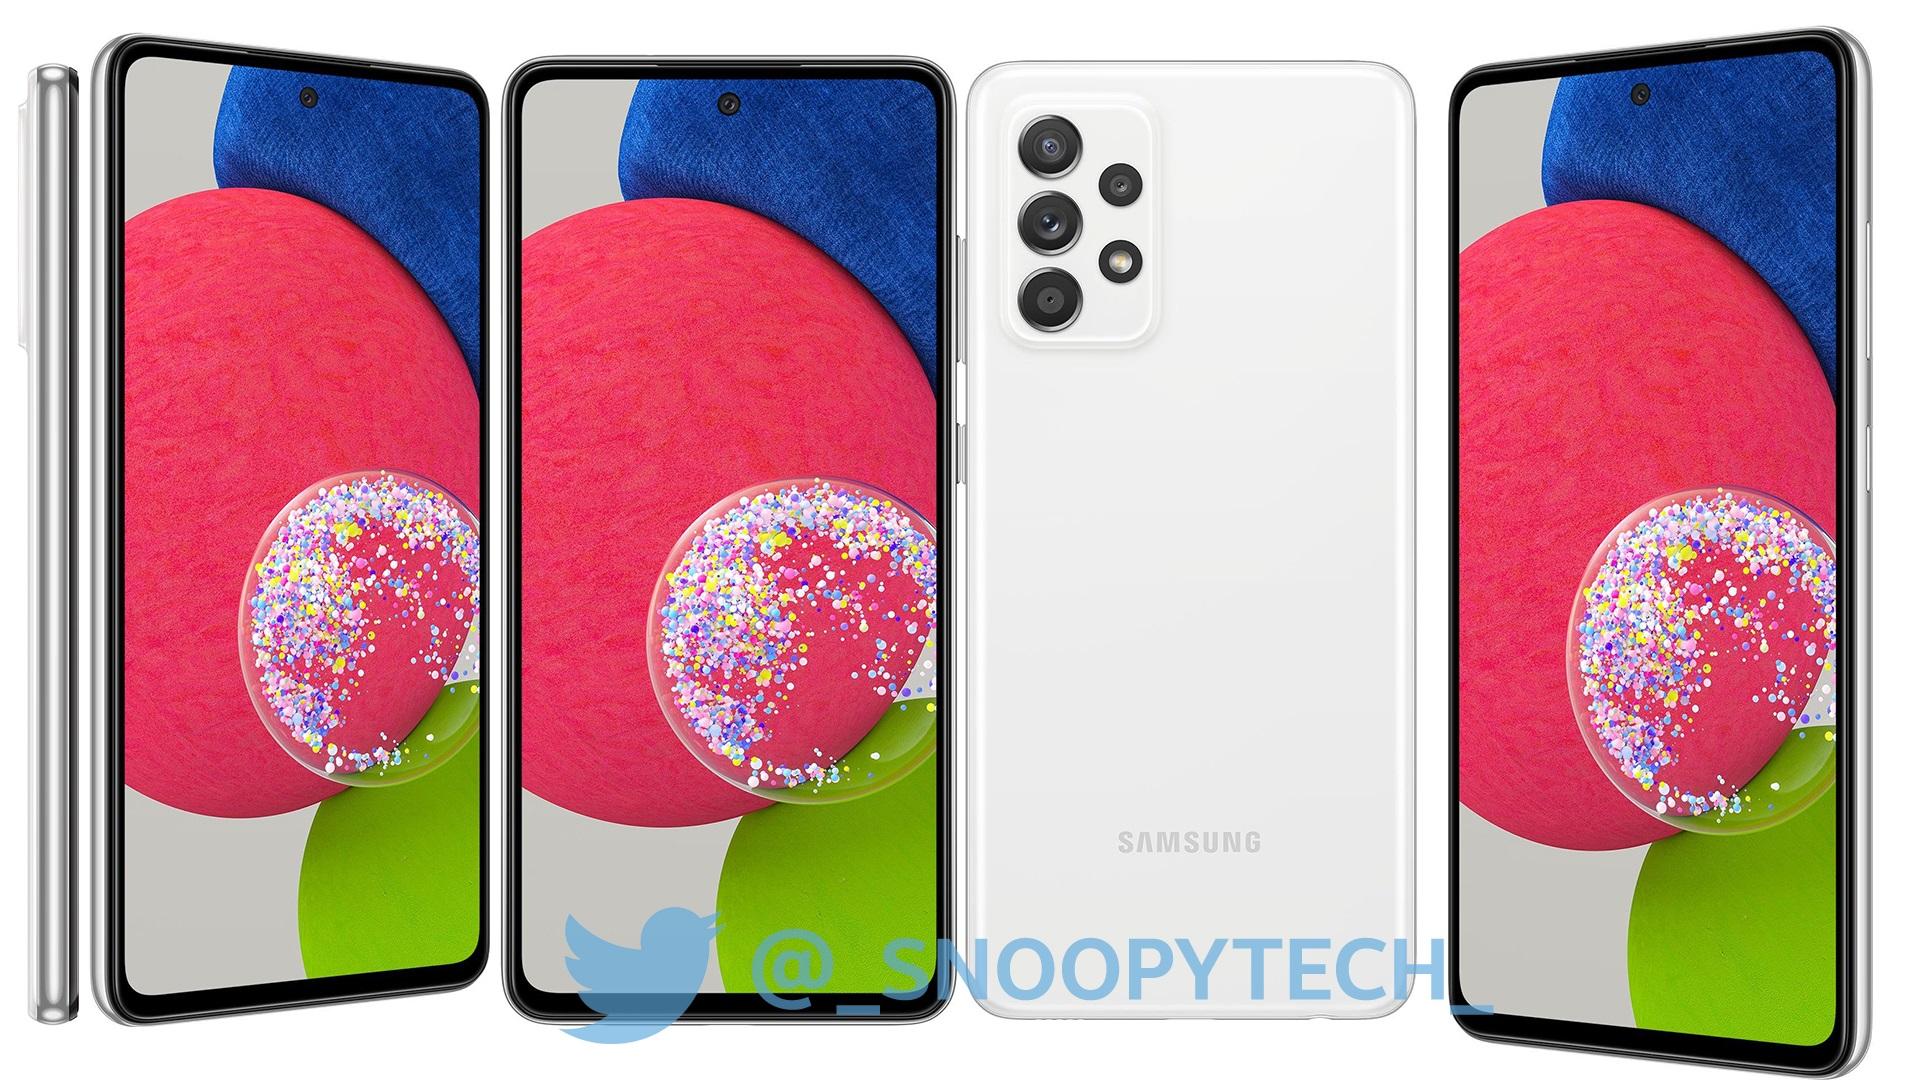 smartfon Samsung Galaxy A52s 5G smartphone